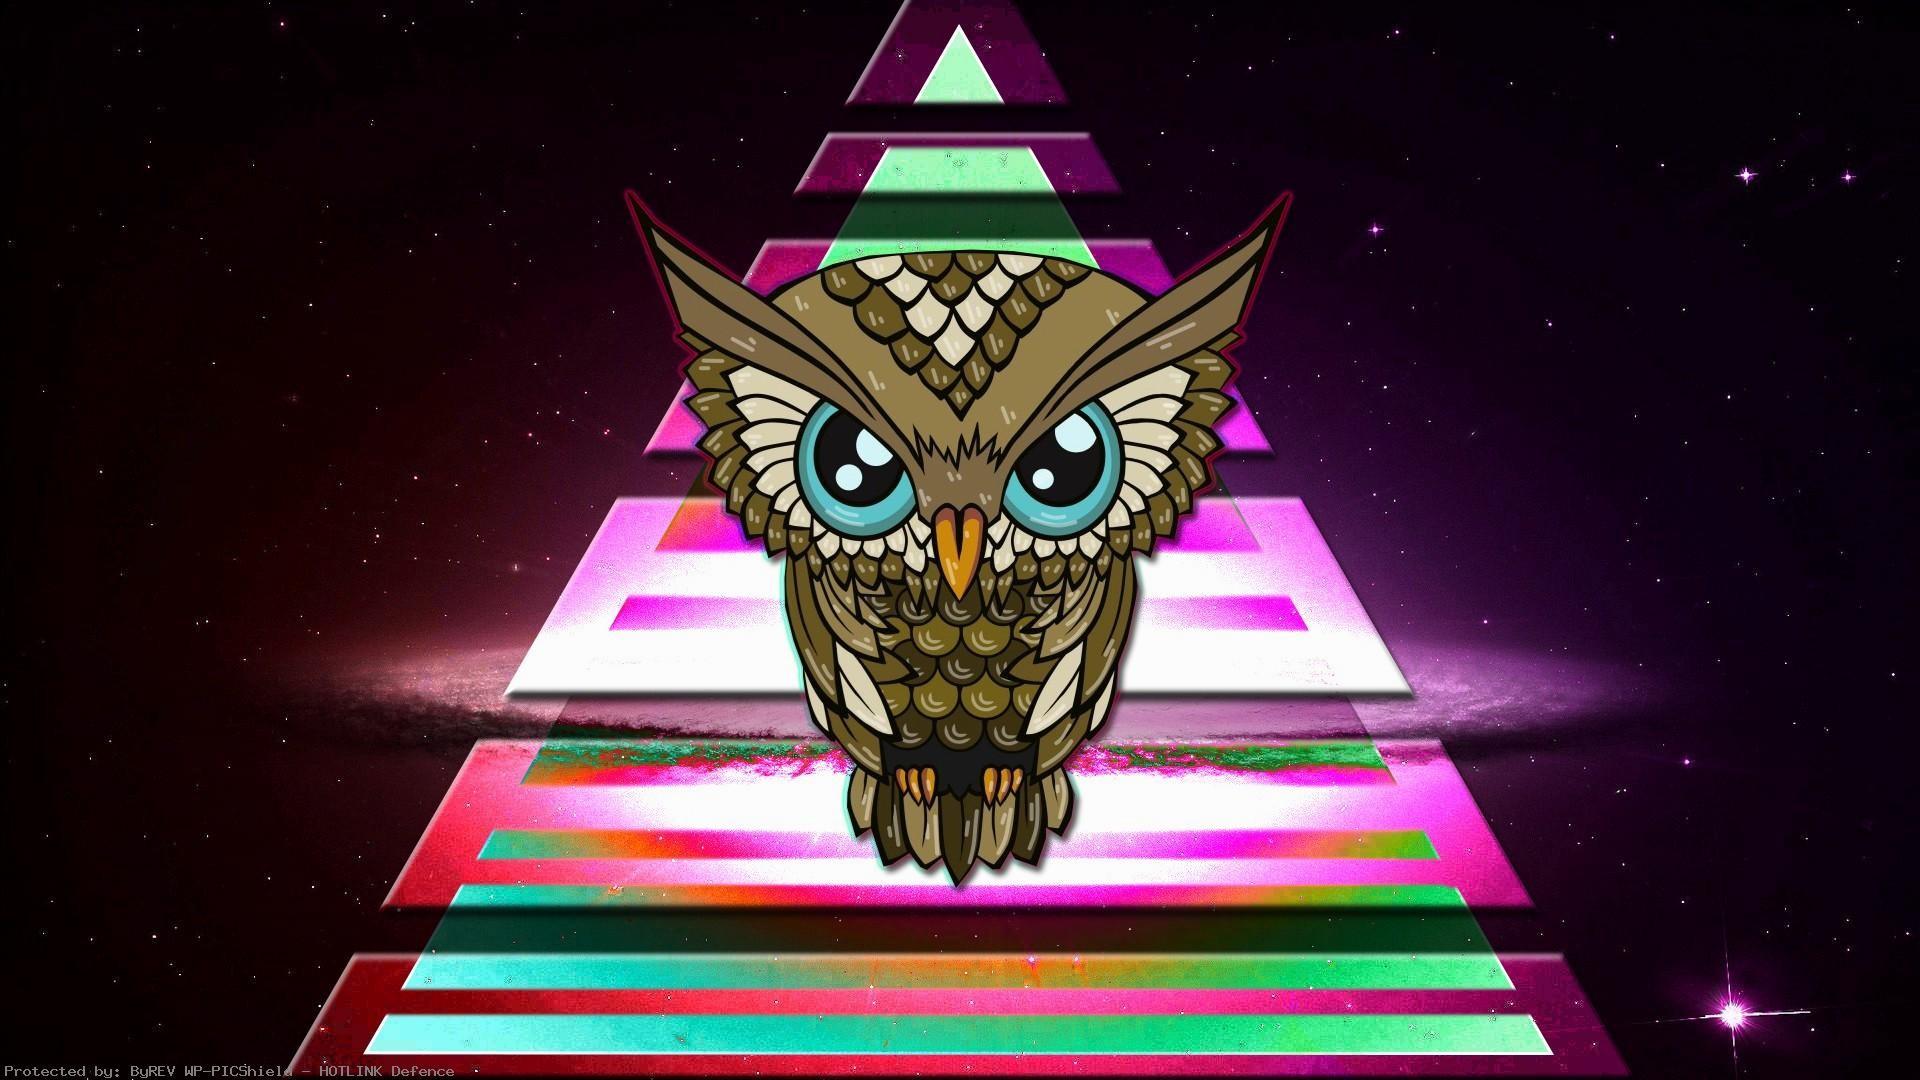 General-1920×1080-owl-triangle-triangle-colorful-space-Illuminati-